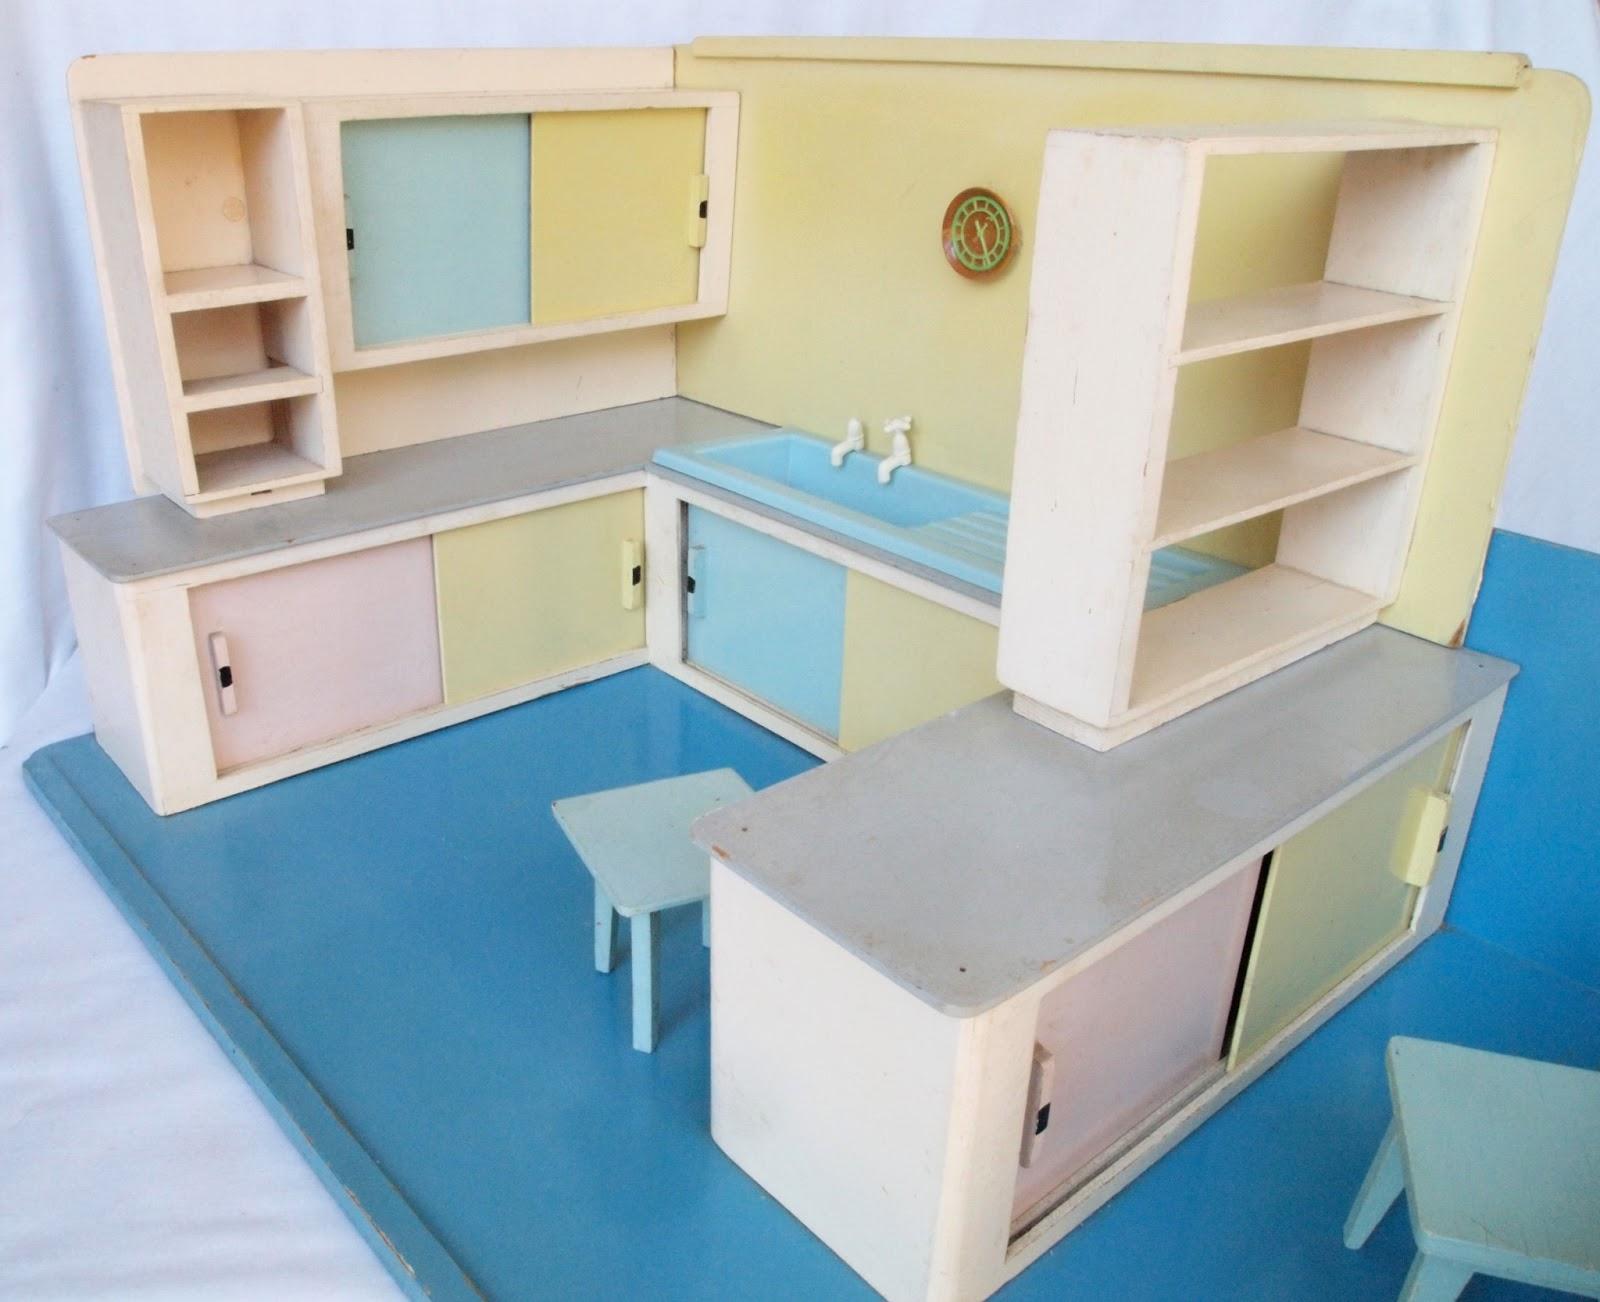 diepuppenstubensammlerin juni 2013. Black Bedroom Furniture Sets. Home Design Ideas